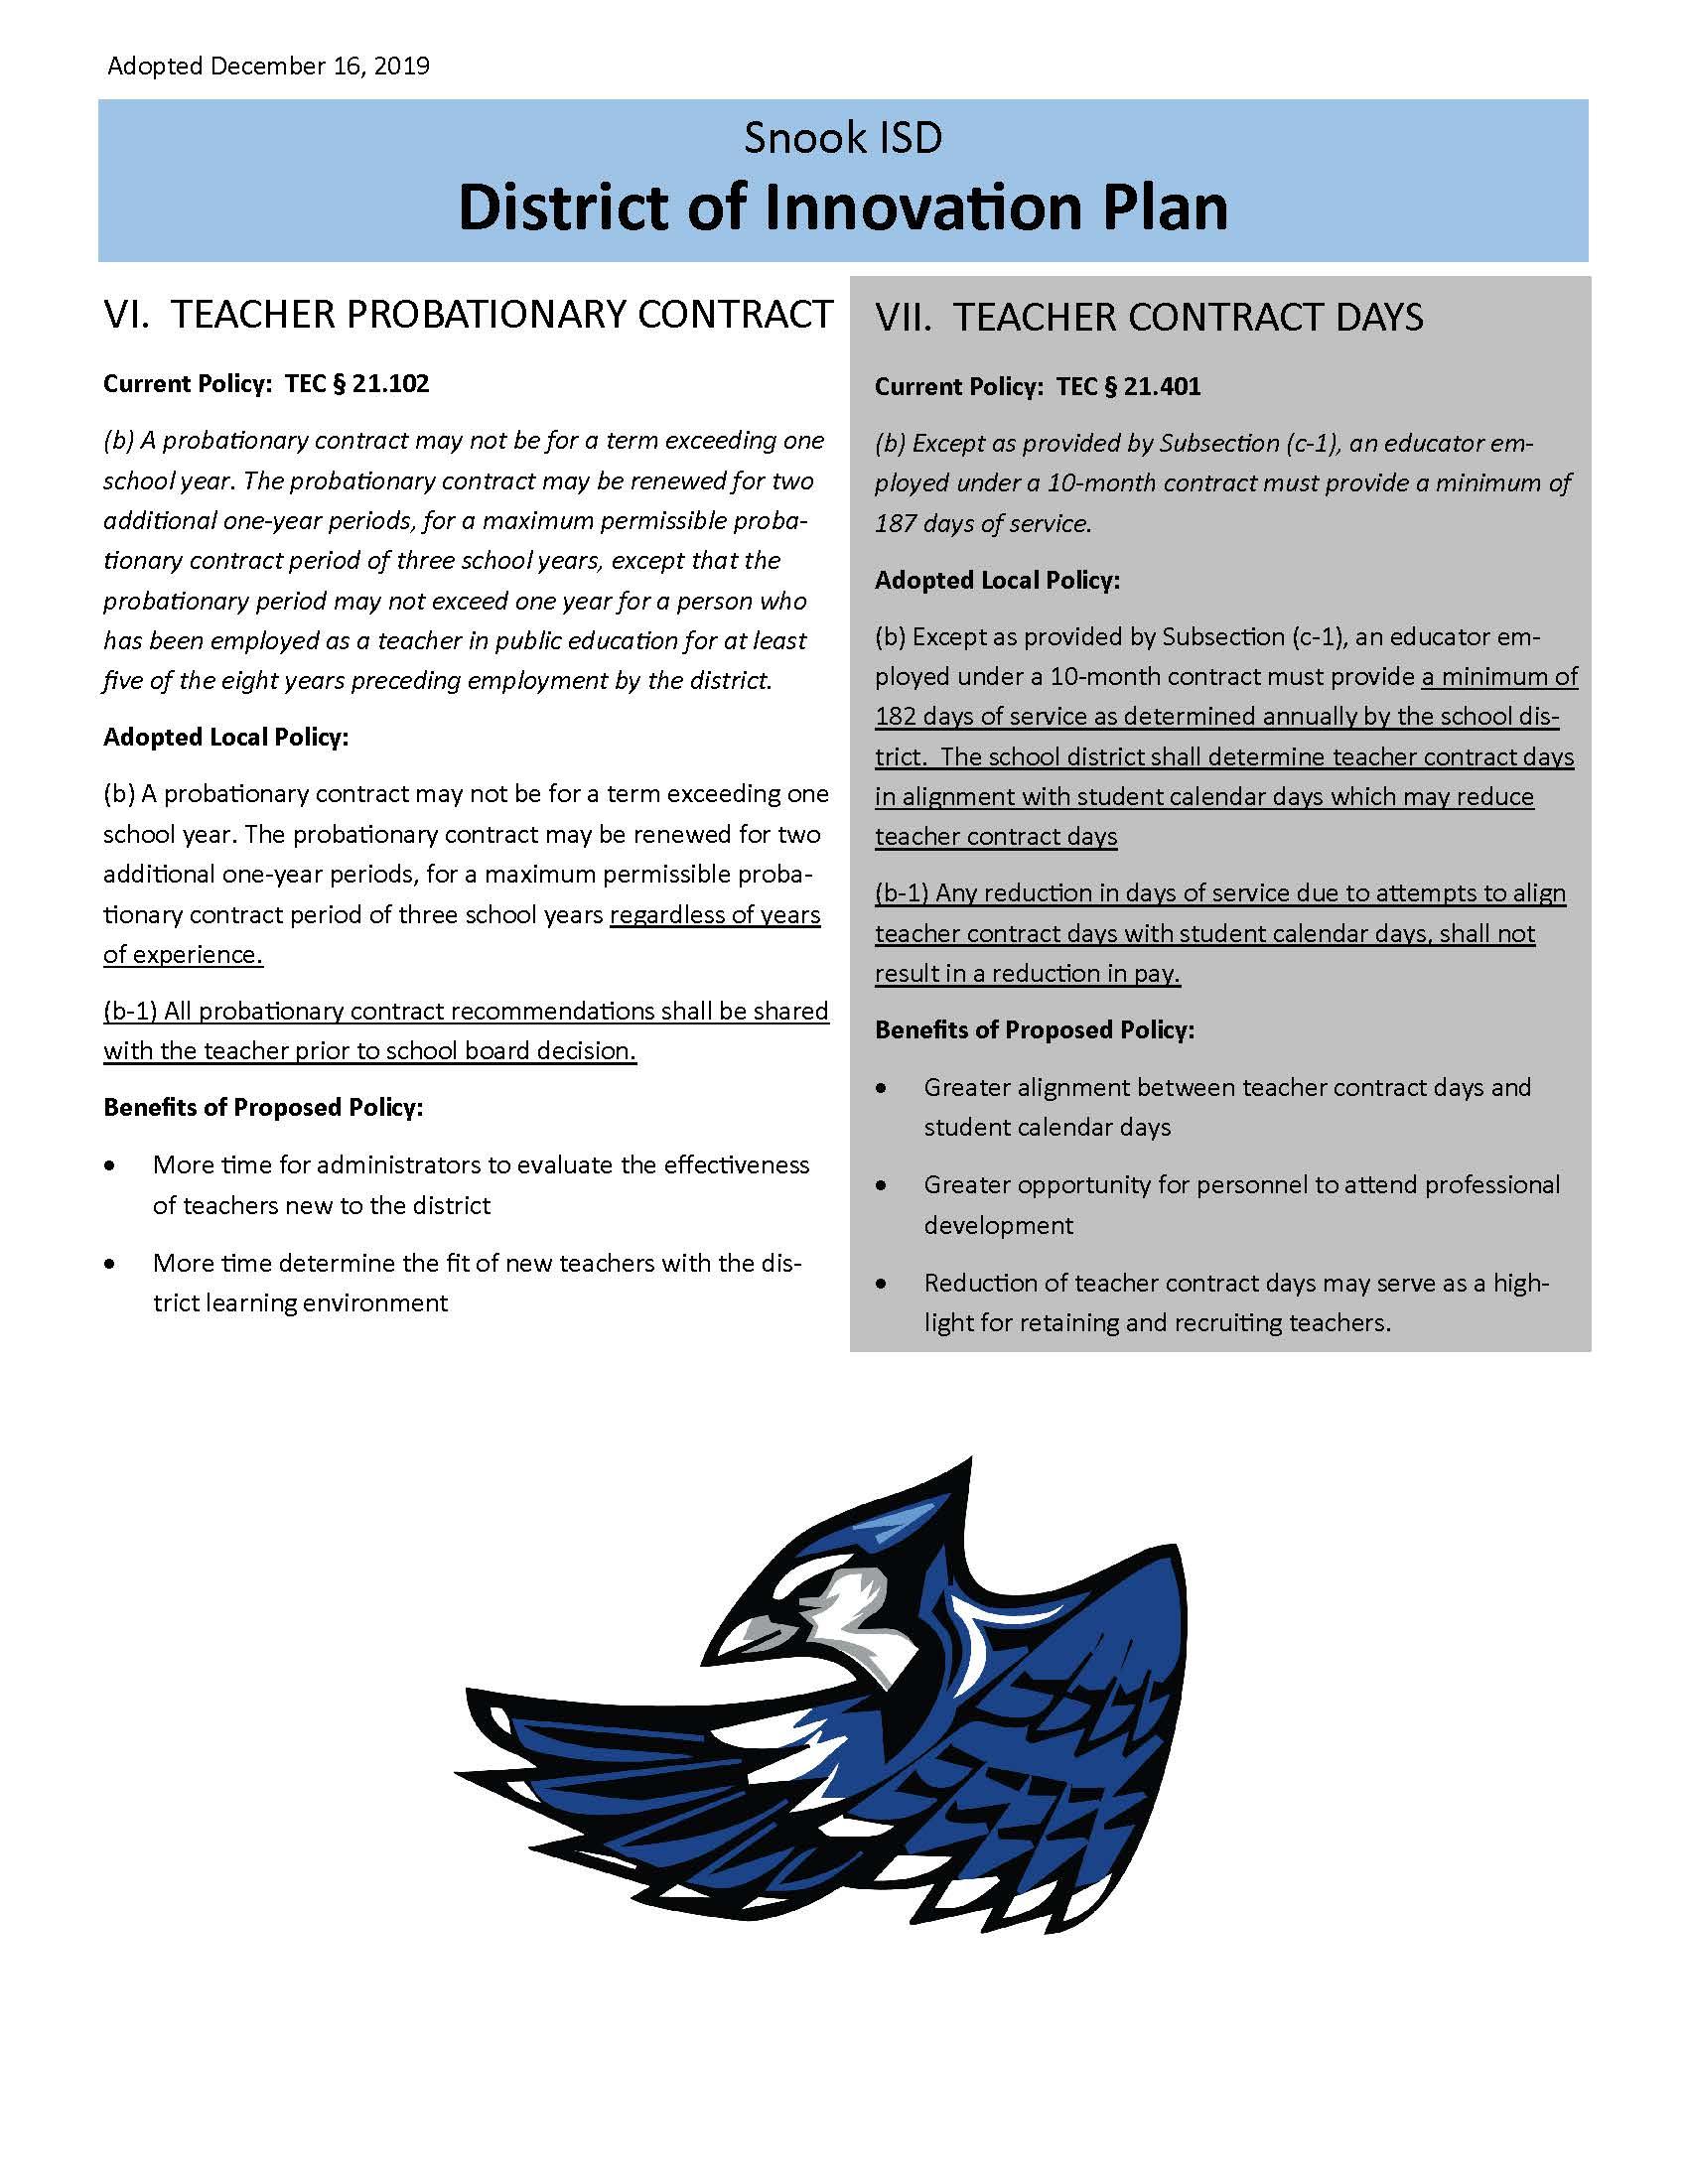 Snook ISD District Innovation Plan document 3